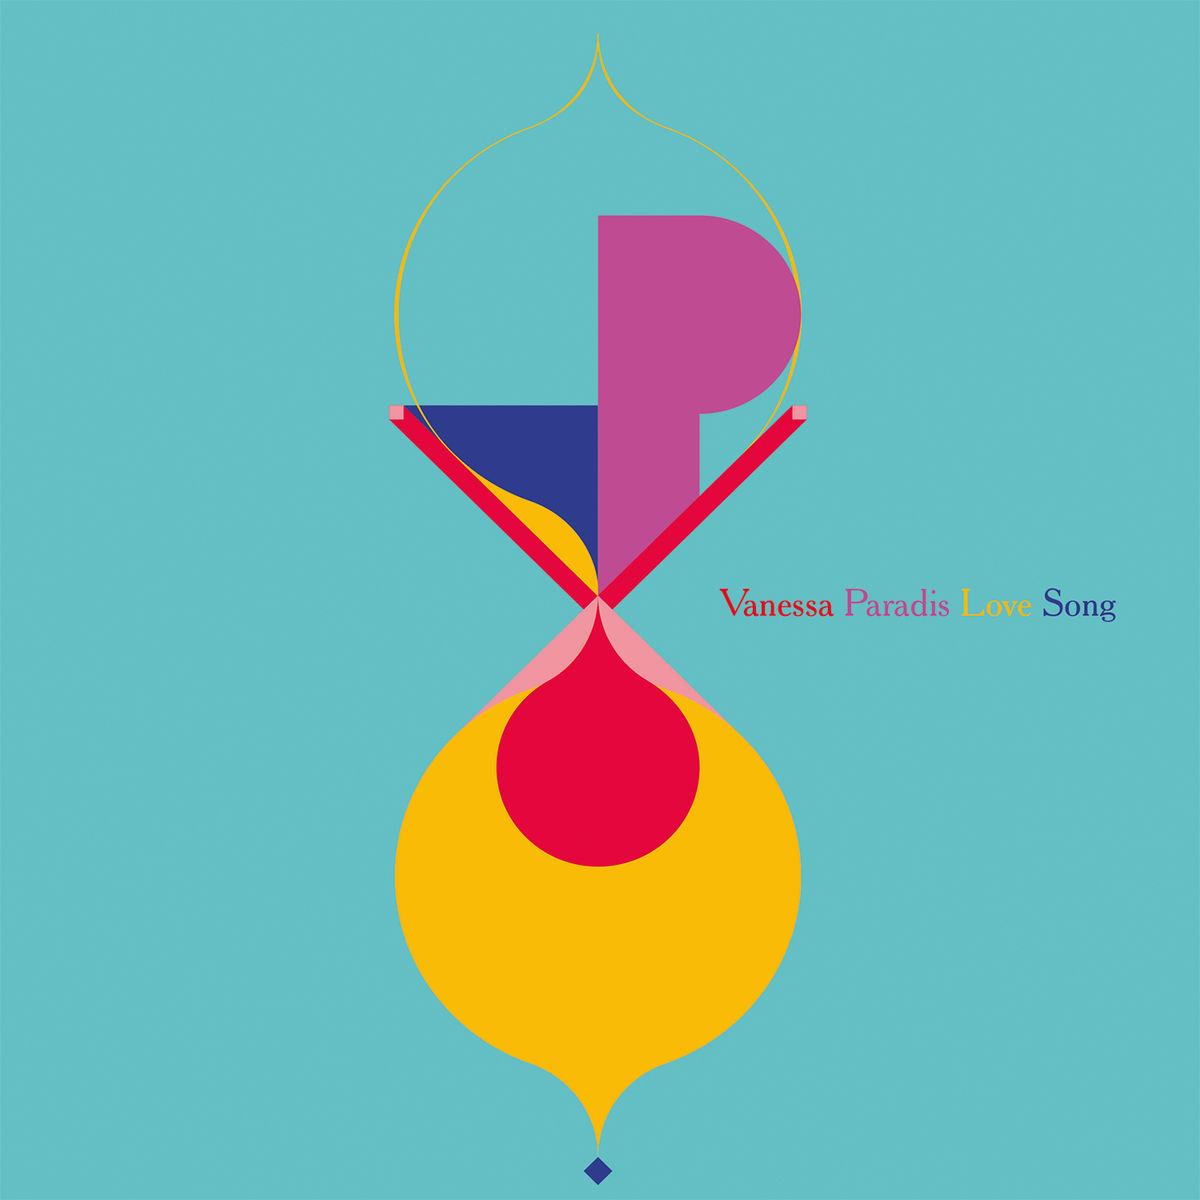 vanessa_paradis-love_song_s.jpg